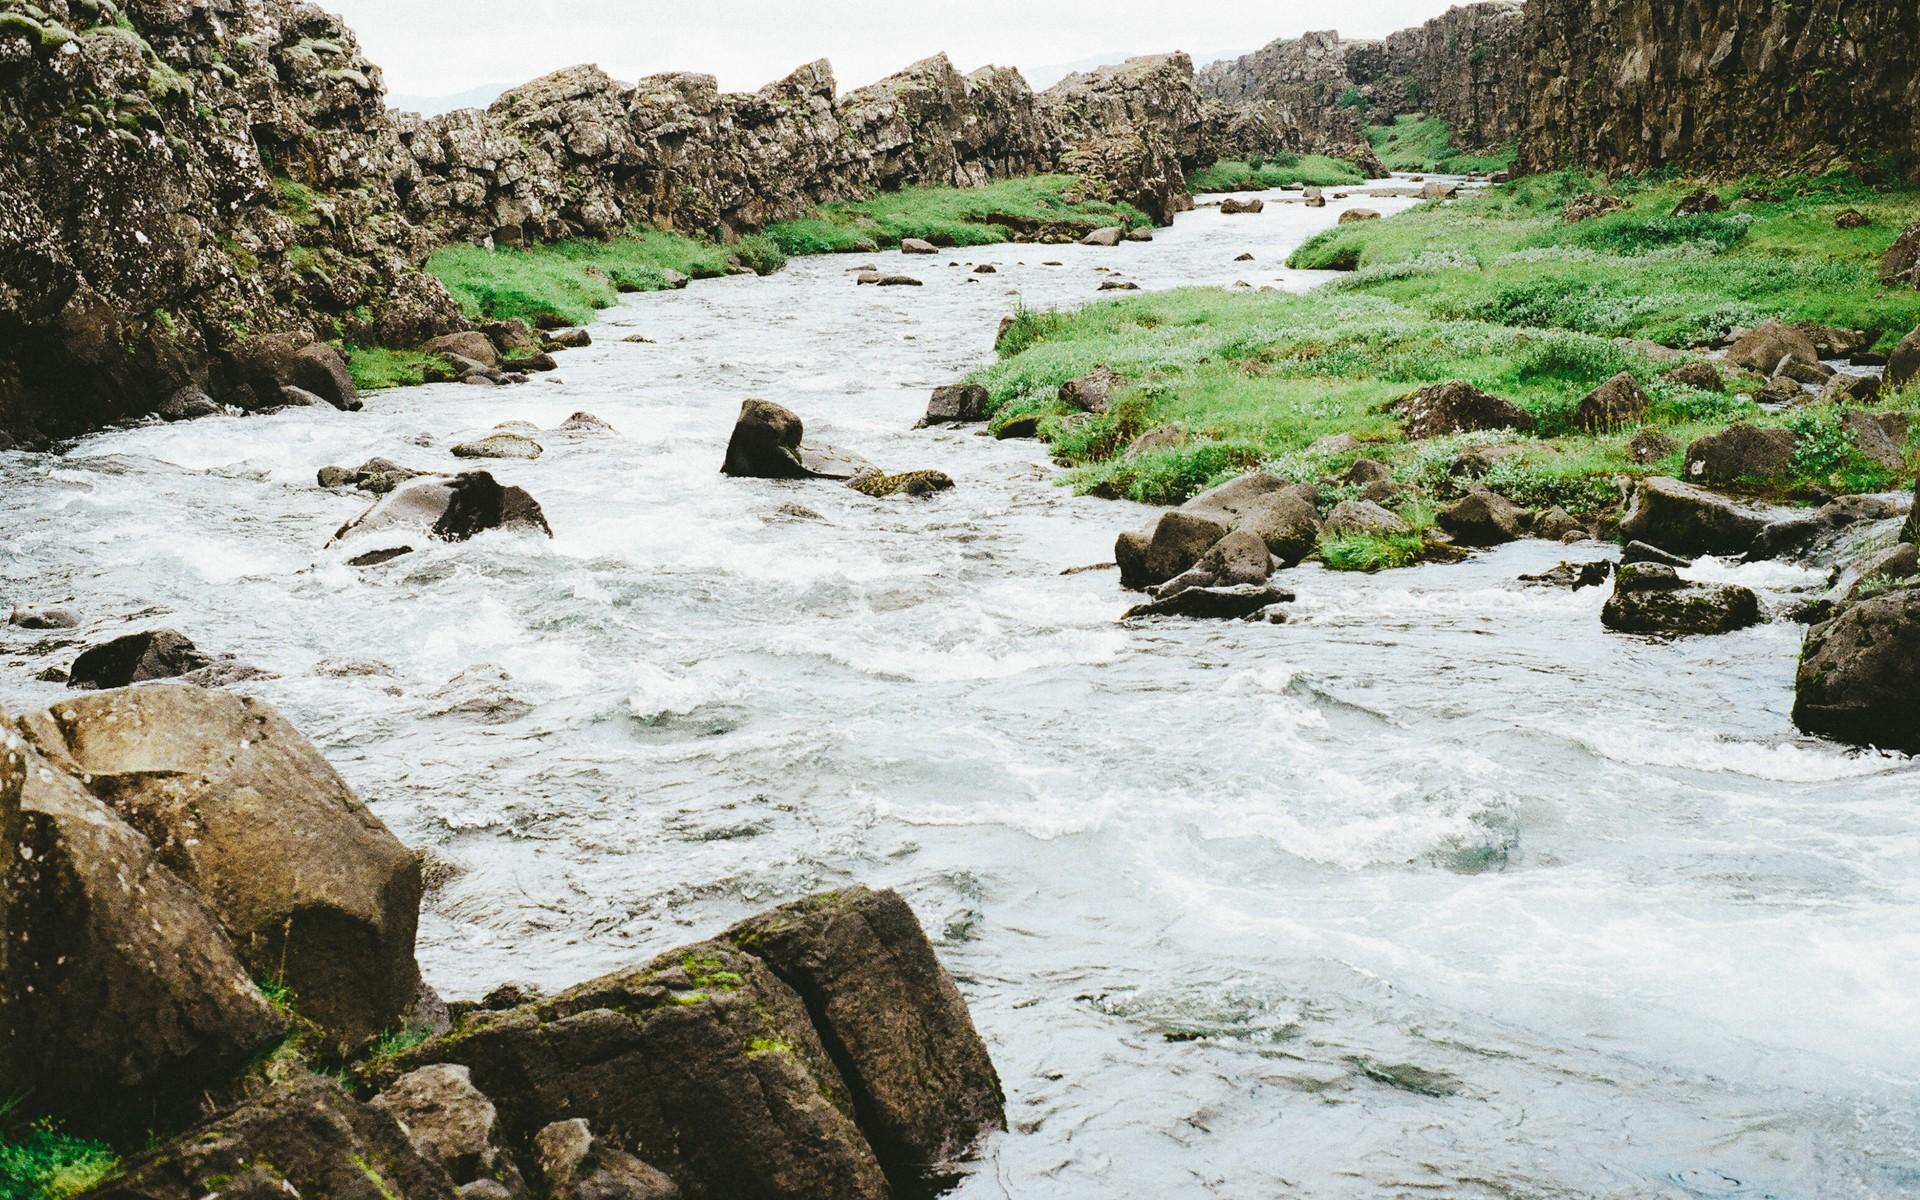 General 1920x1200 water river creeks rocks landscape nature